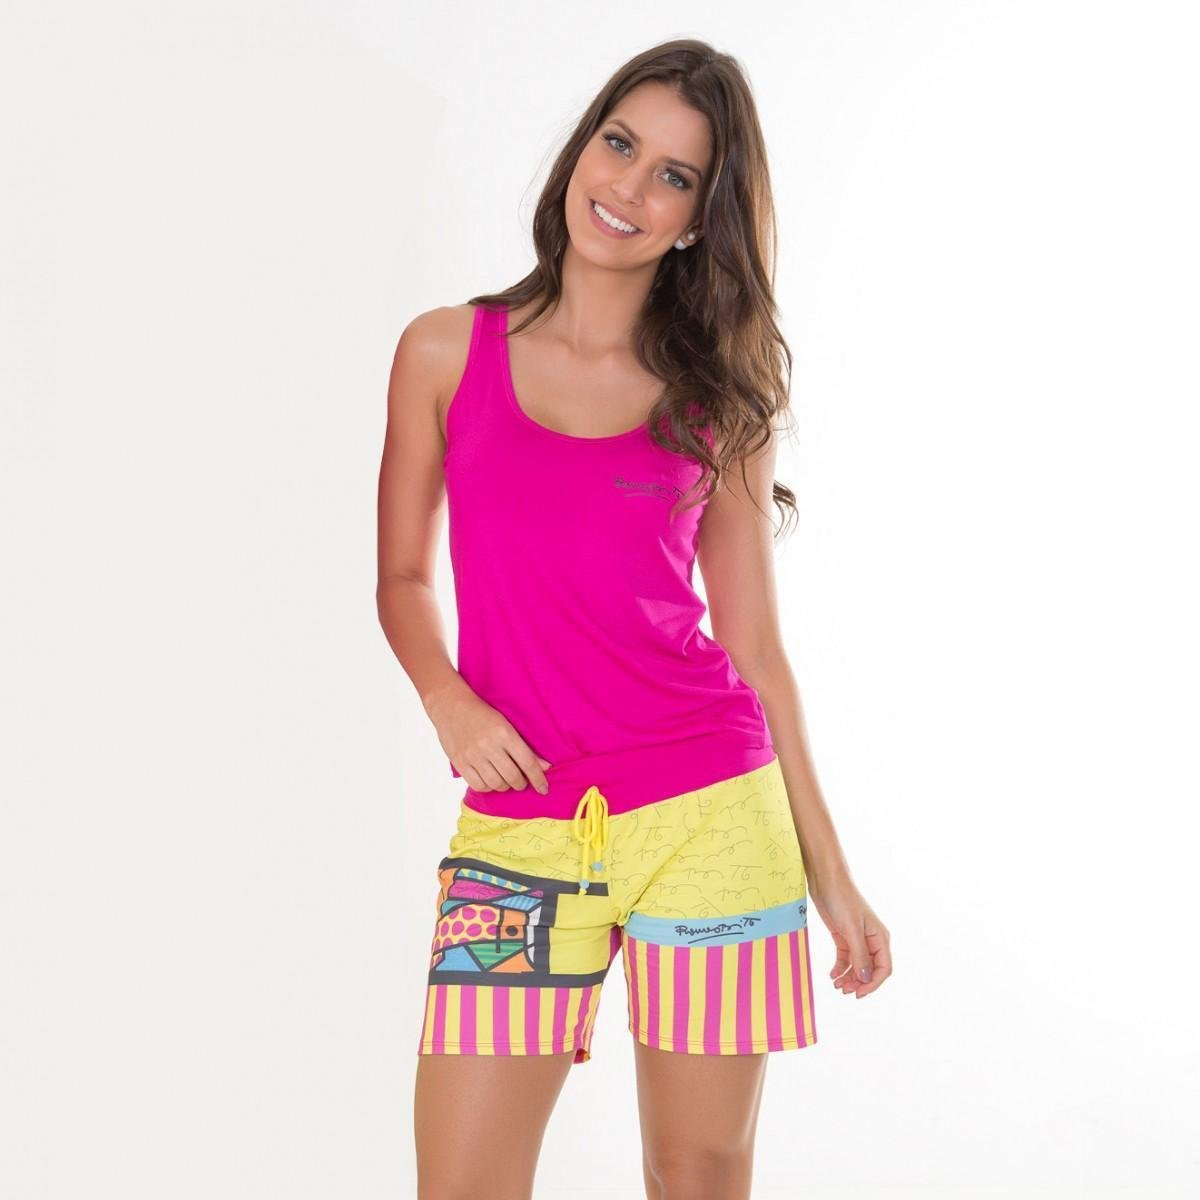 Rosa Pijama Regata Regata 08621 Viscose Recco Pijama YFY8wqr